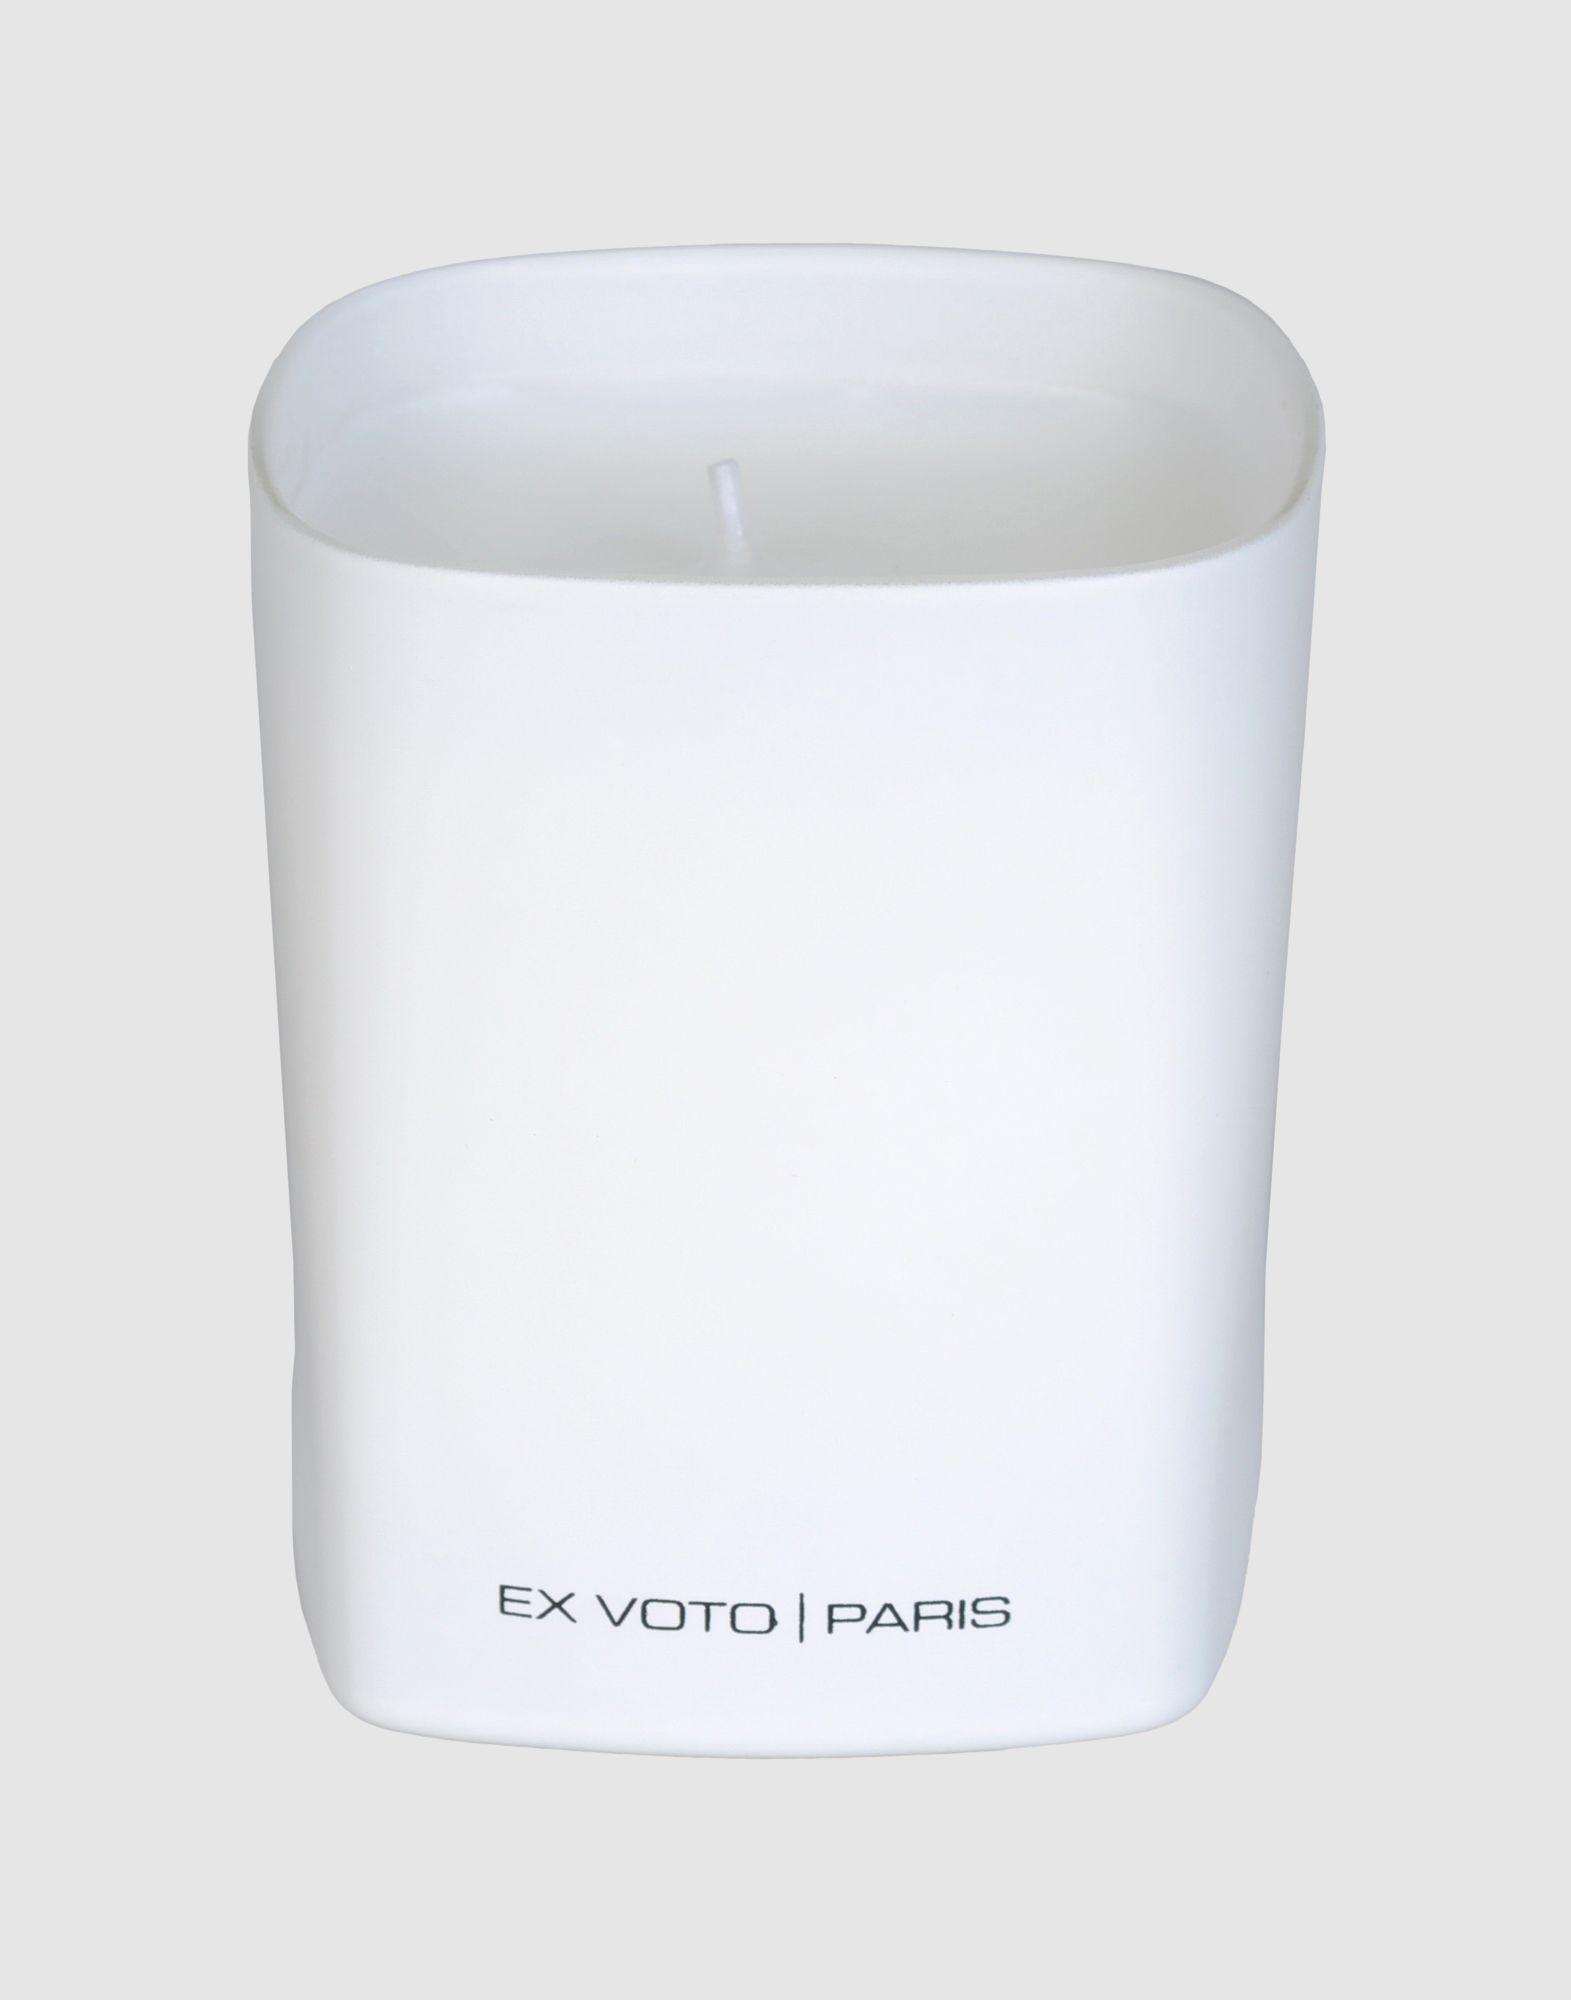 Ex Voto Candles